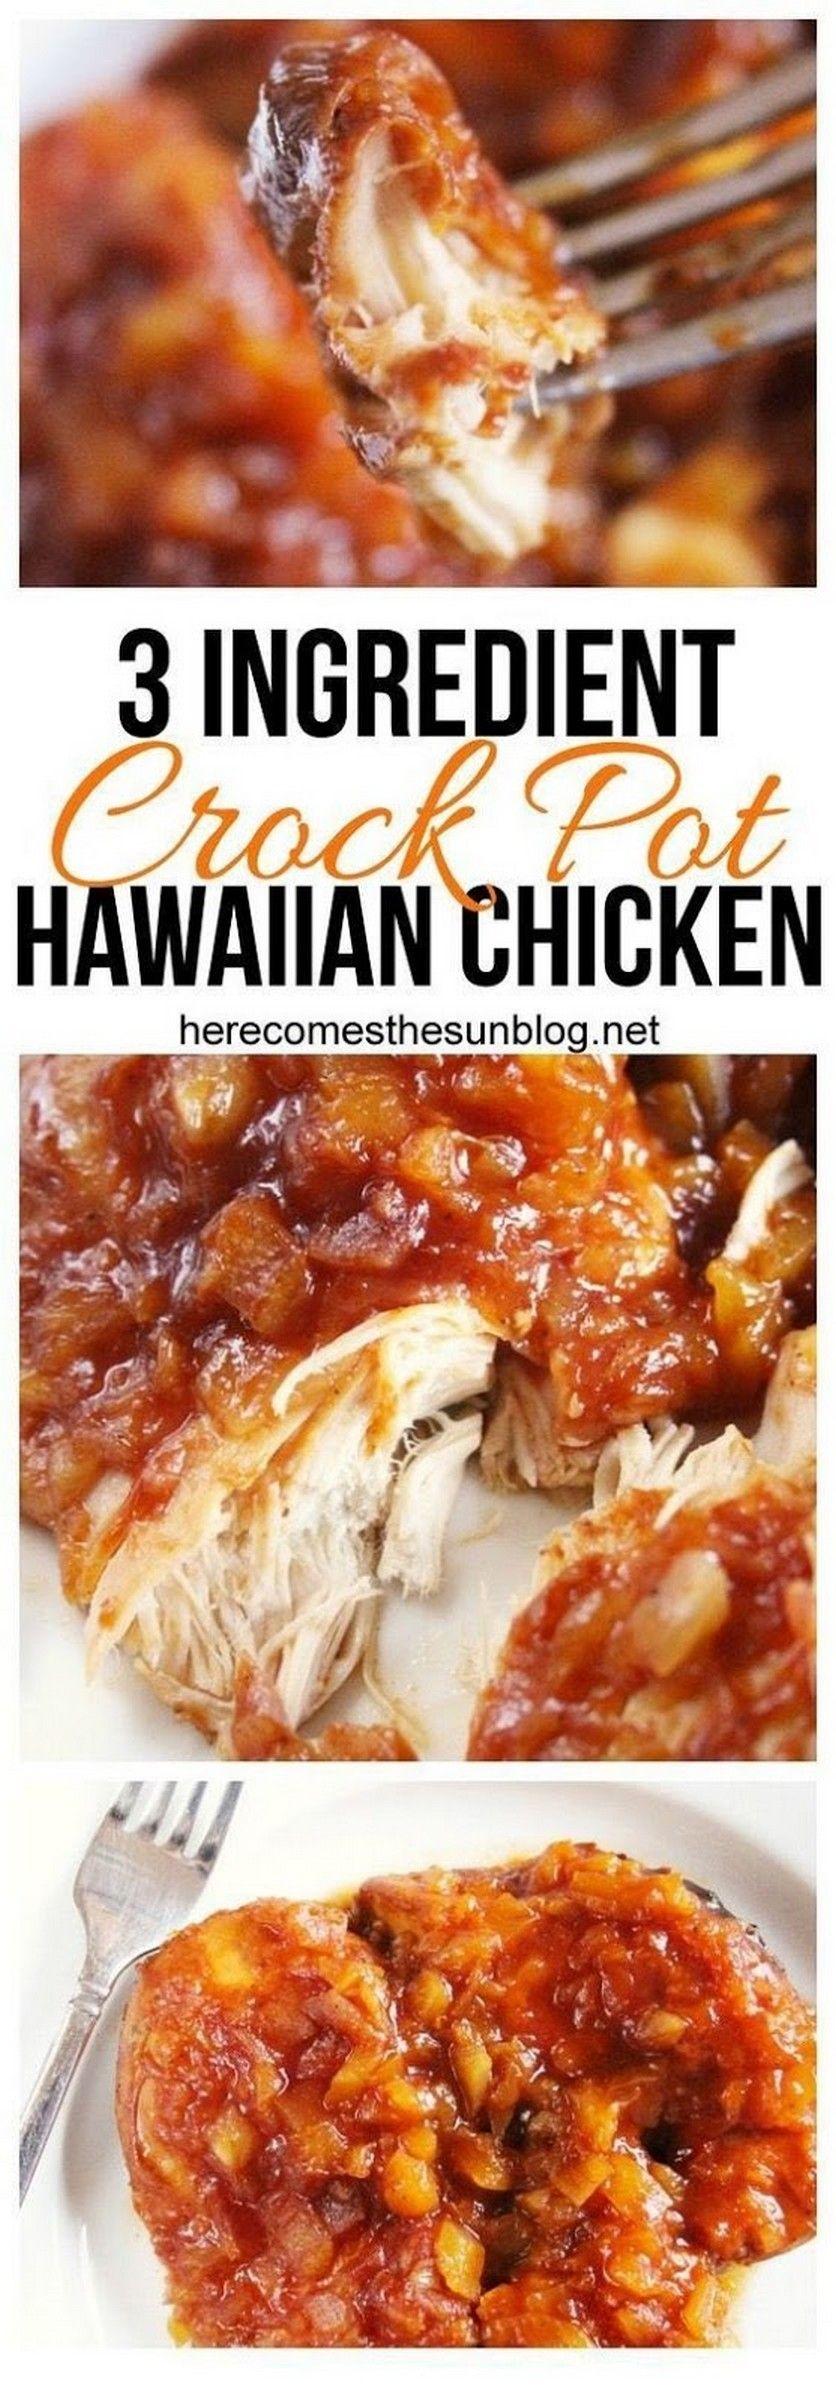 3 Ingredient Crock Pot Hawaiian Chicken #easysausagerecipes